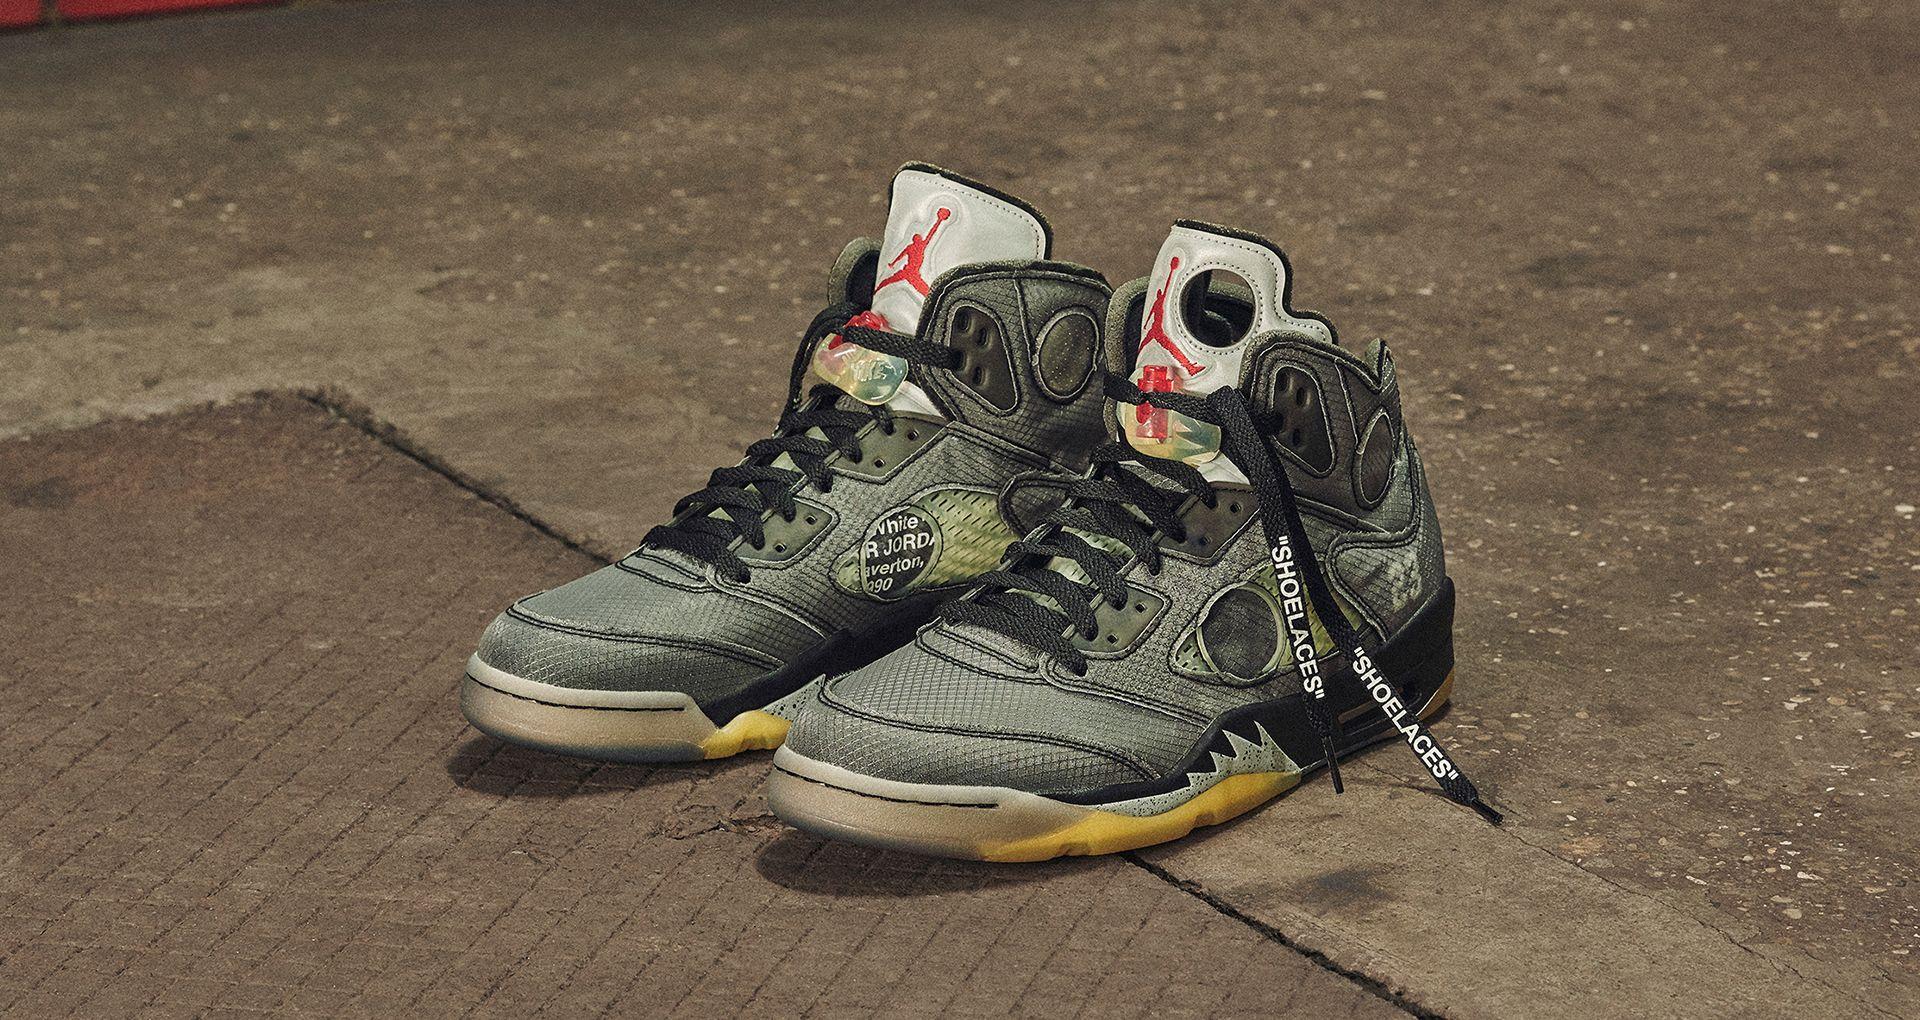 Off White Jordan 5 mi van a cipő mögött? sneakerbox.hu blog